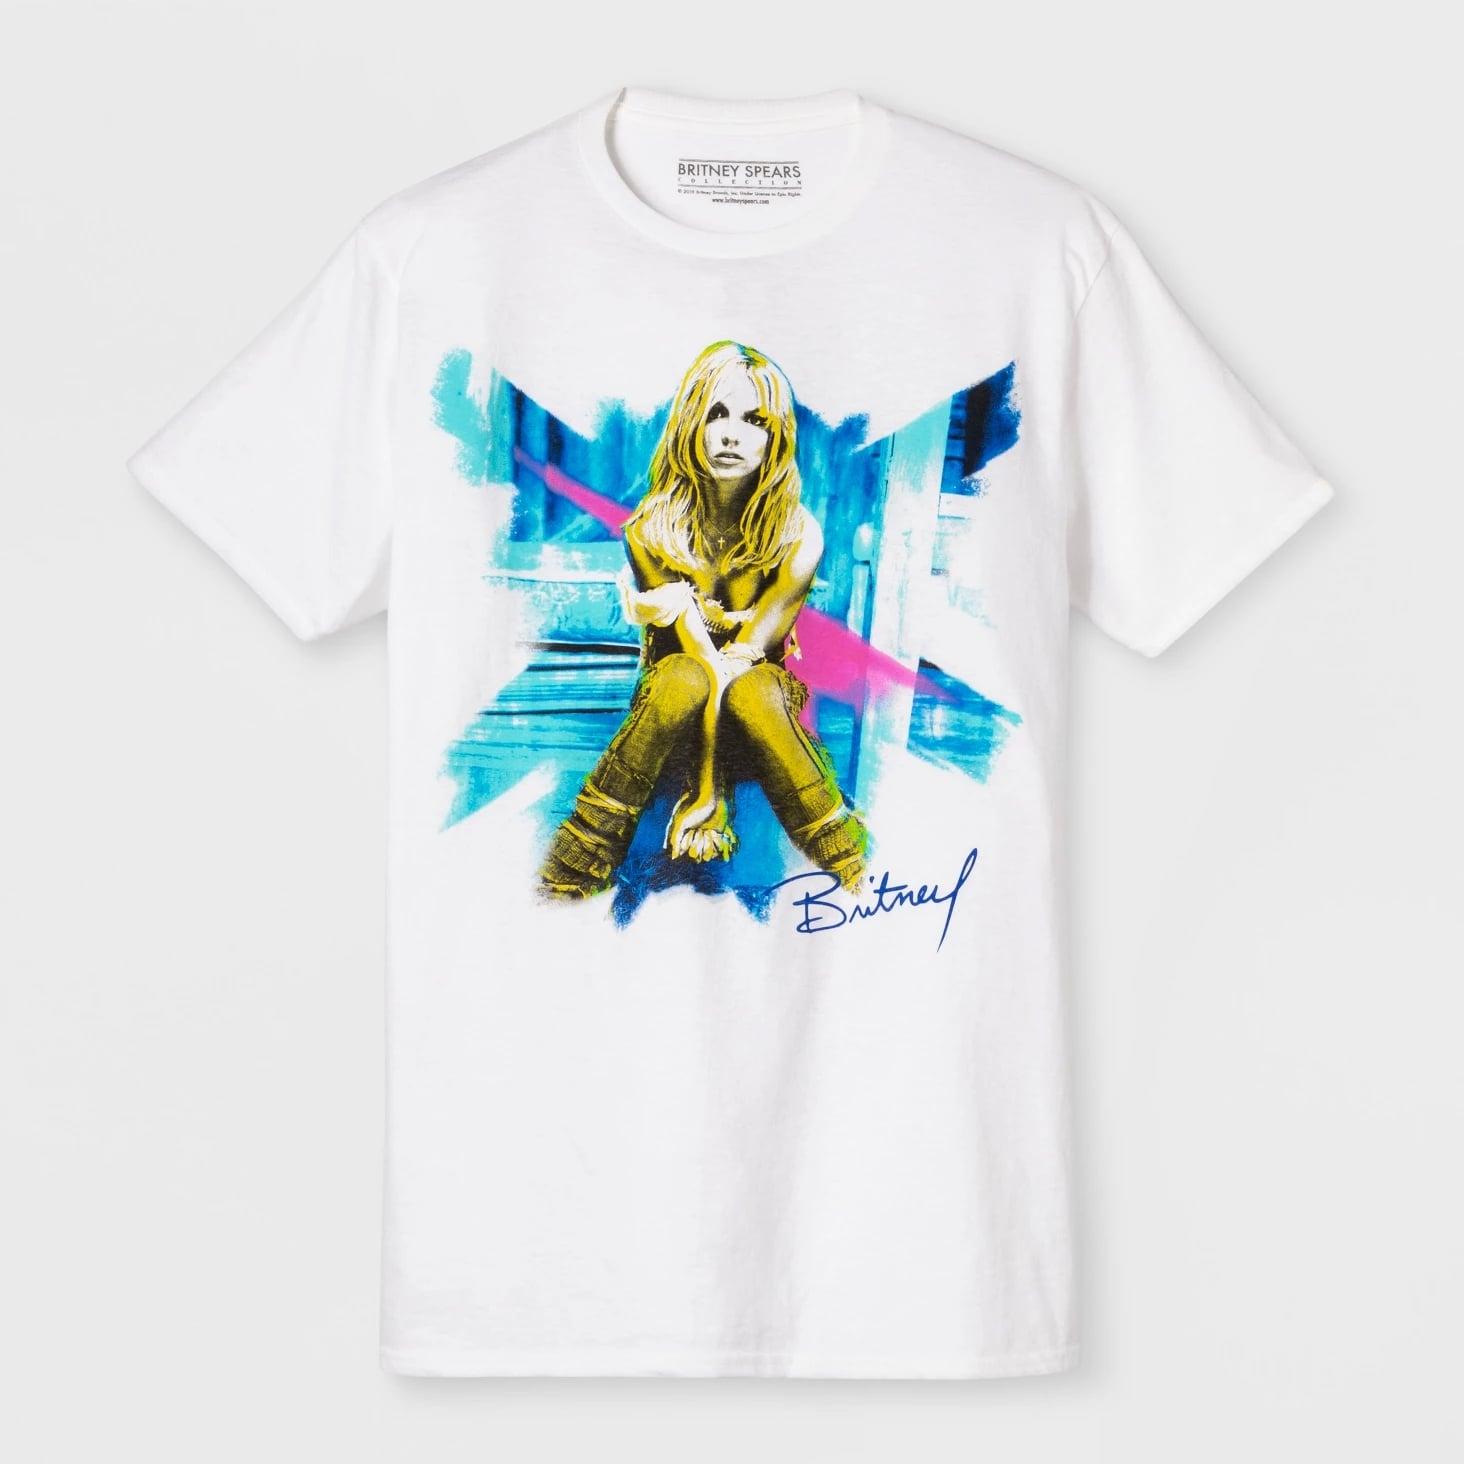 Short-Sleeve-Britney-Spears-Crew-T-Shirt